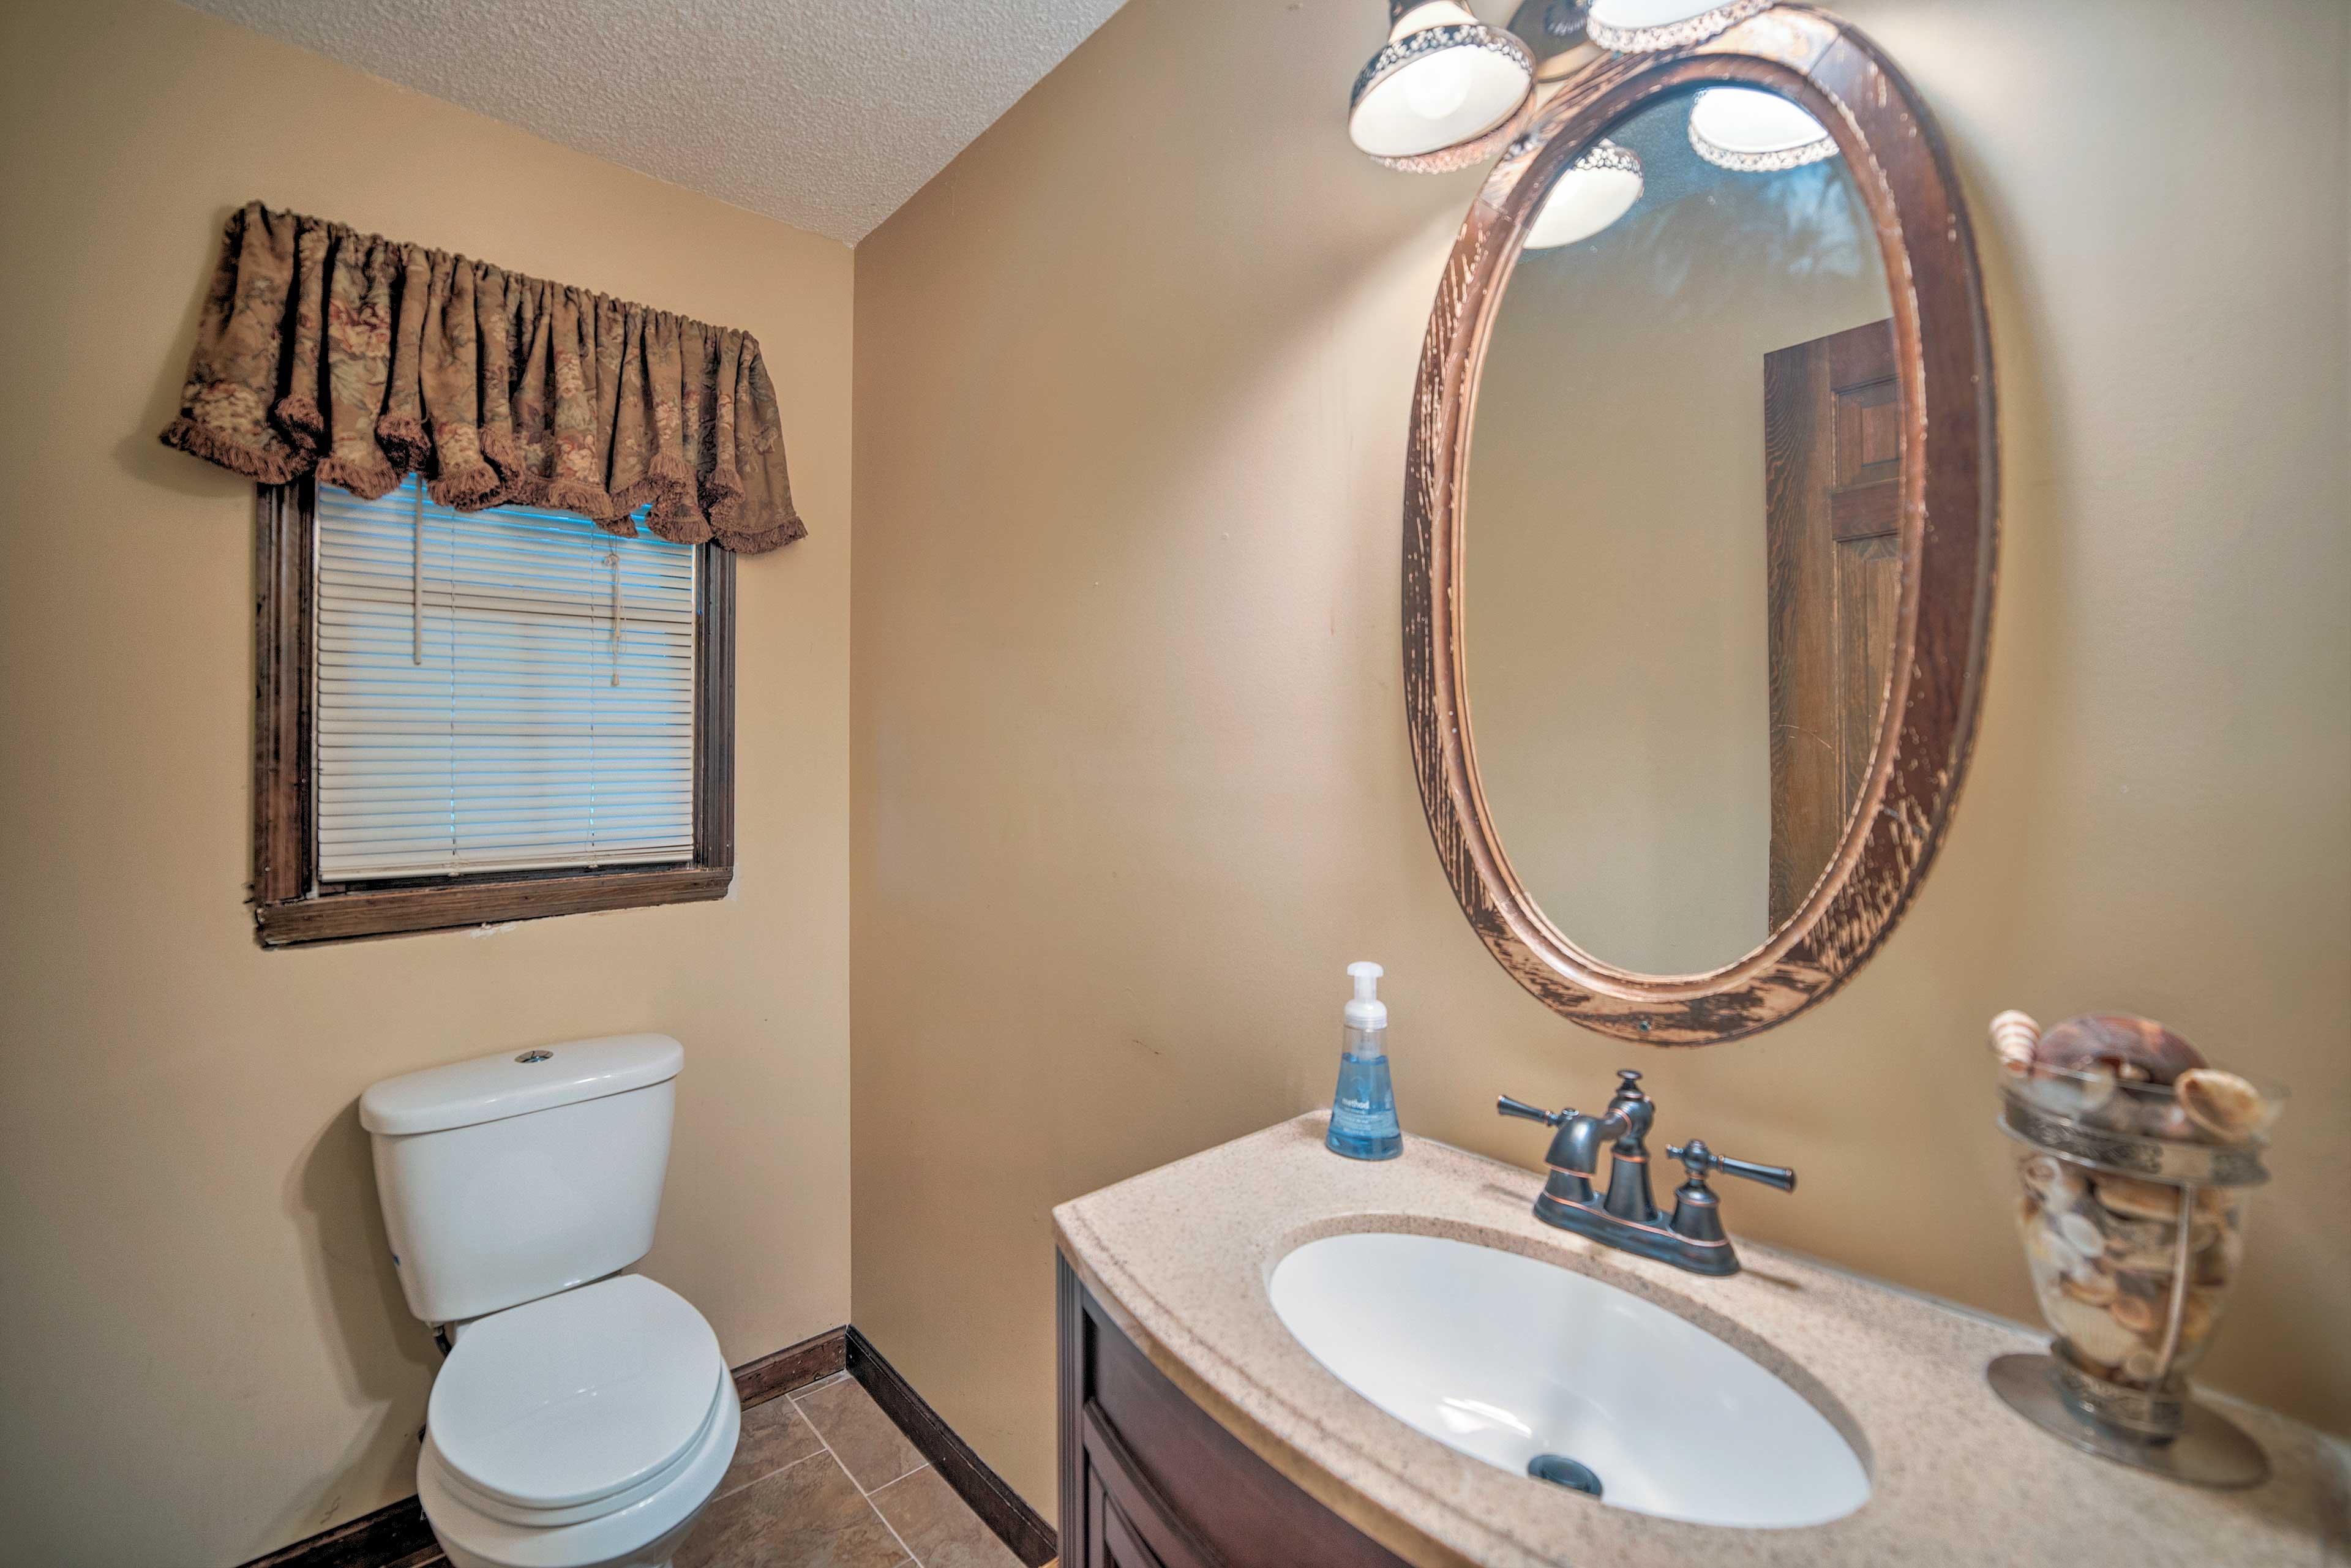 A half bathroom provides added privacy.